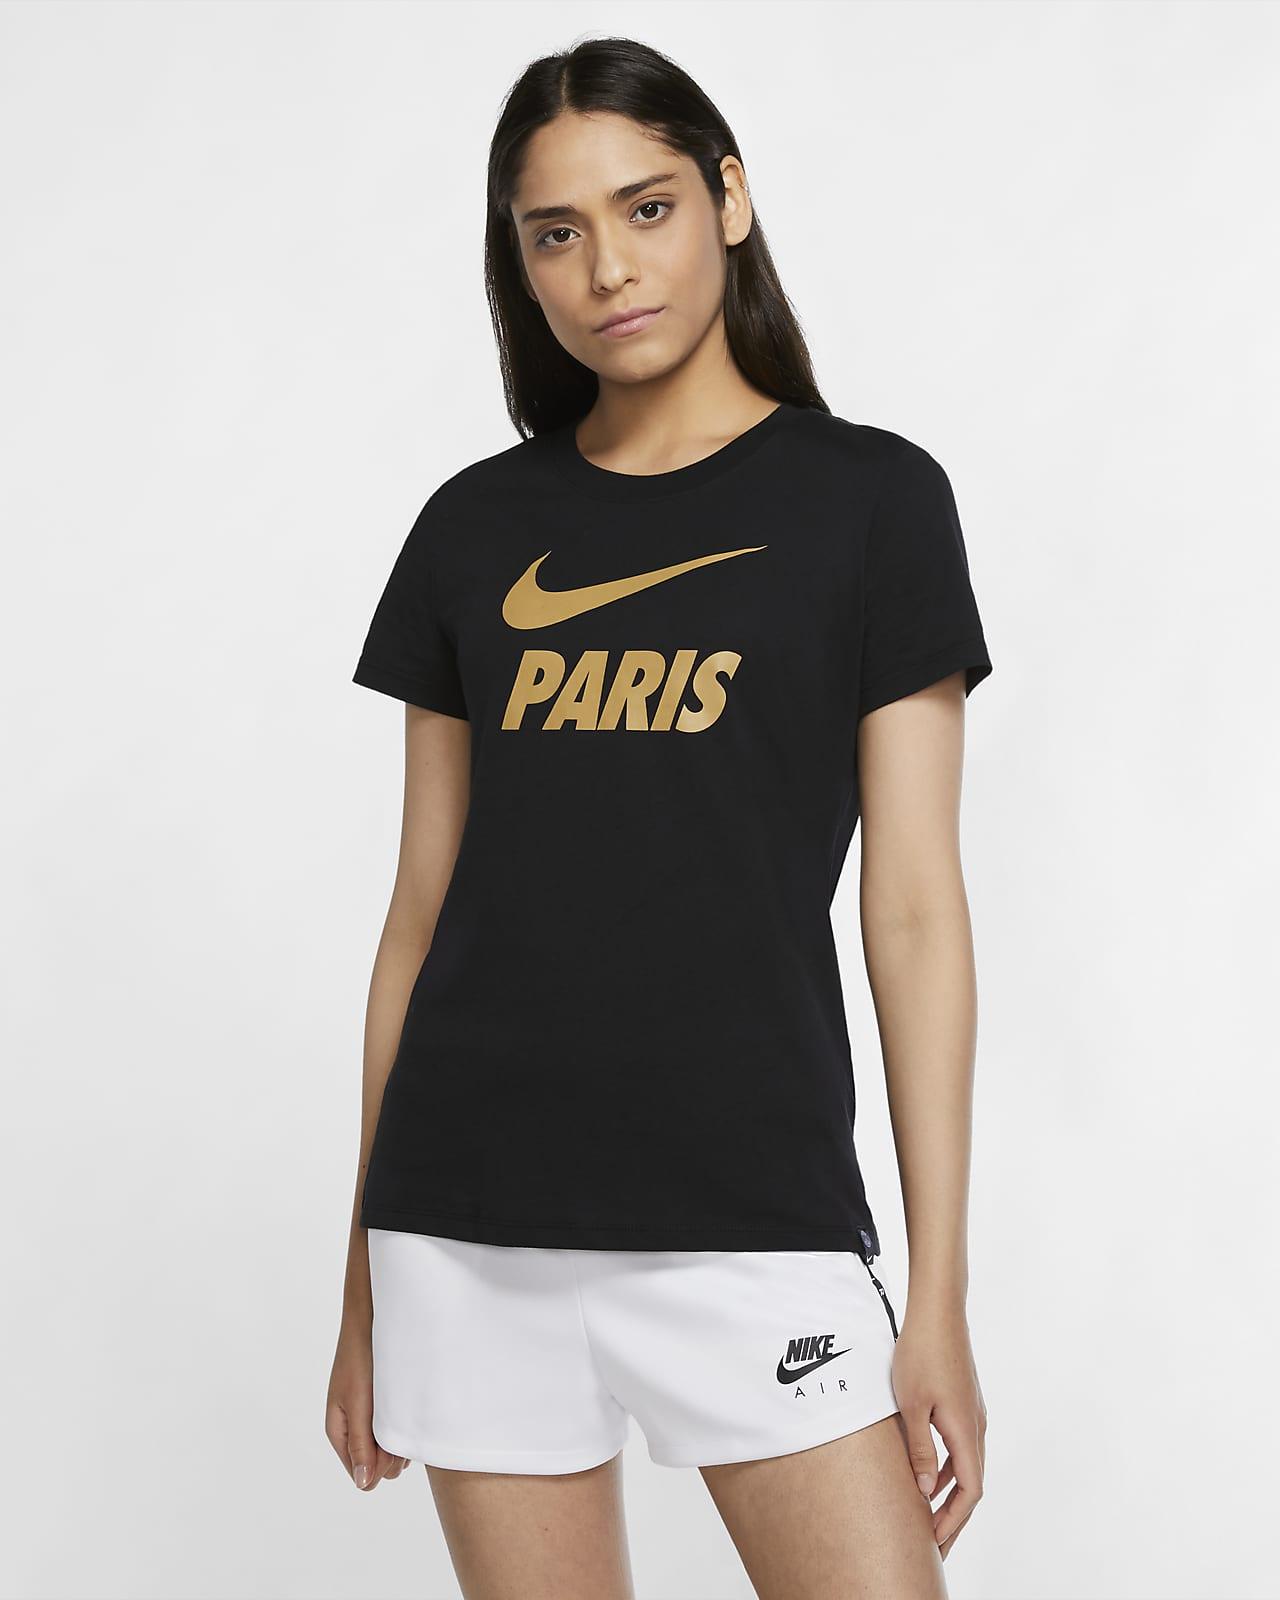 Playera de fútbol para mujer Paris Saint-Germain